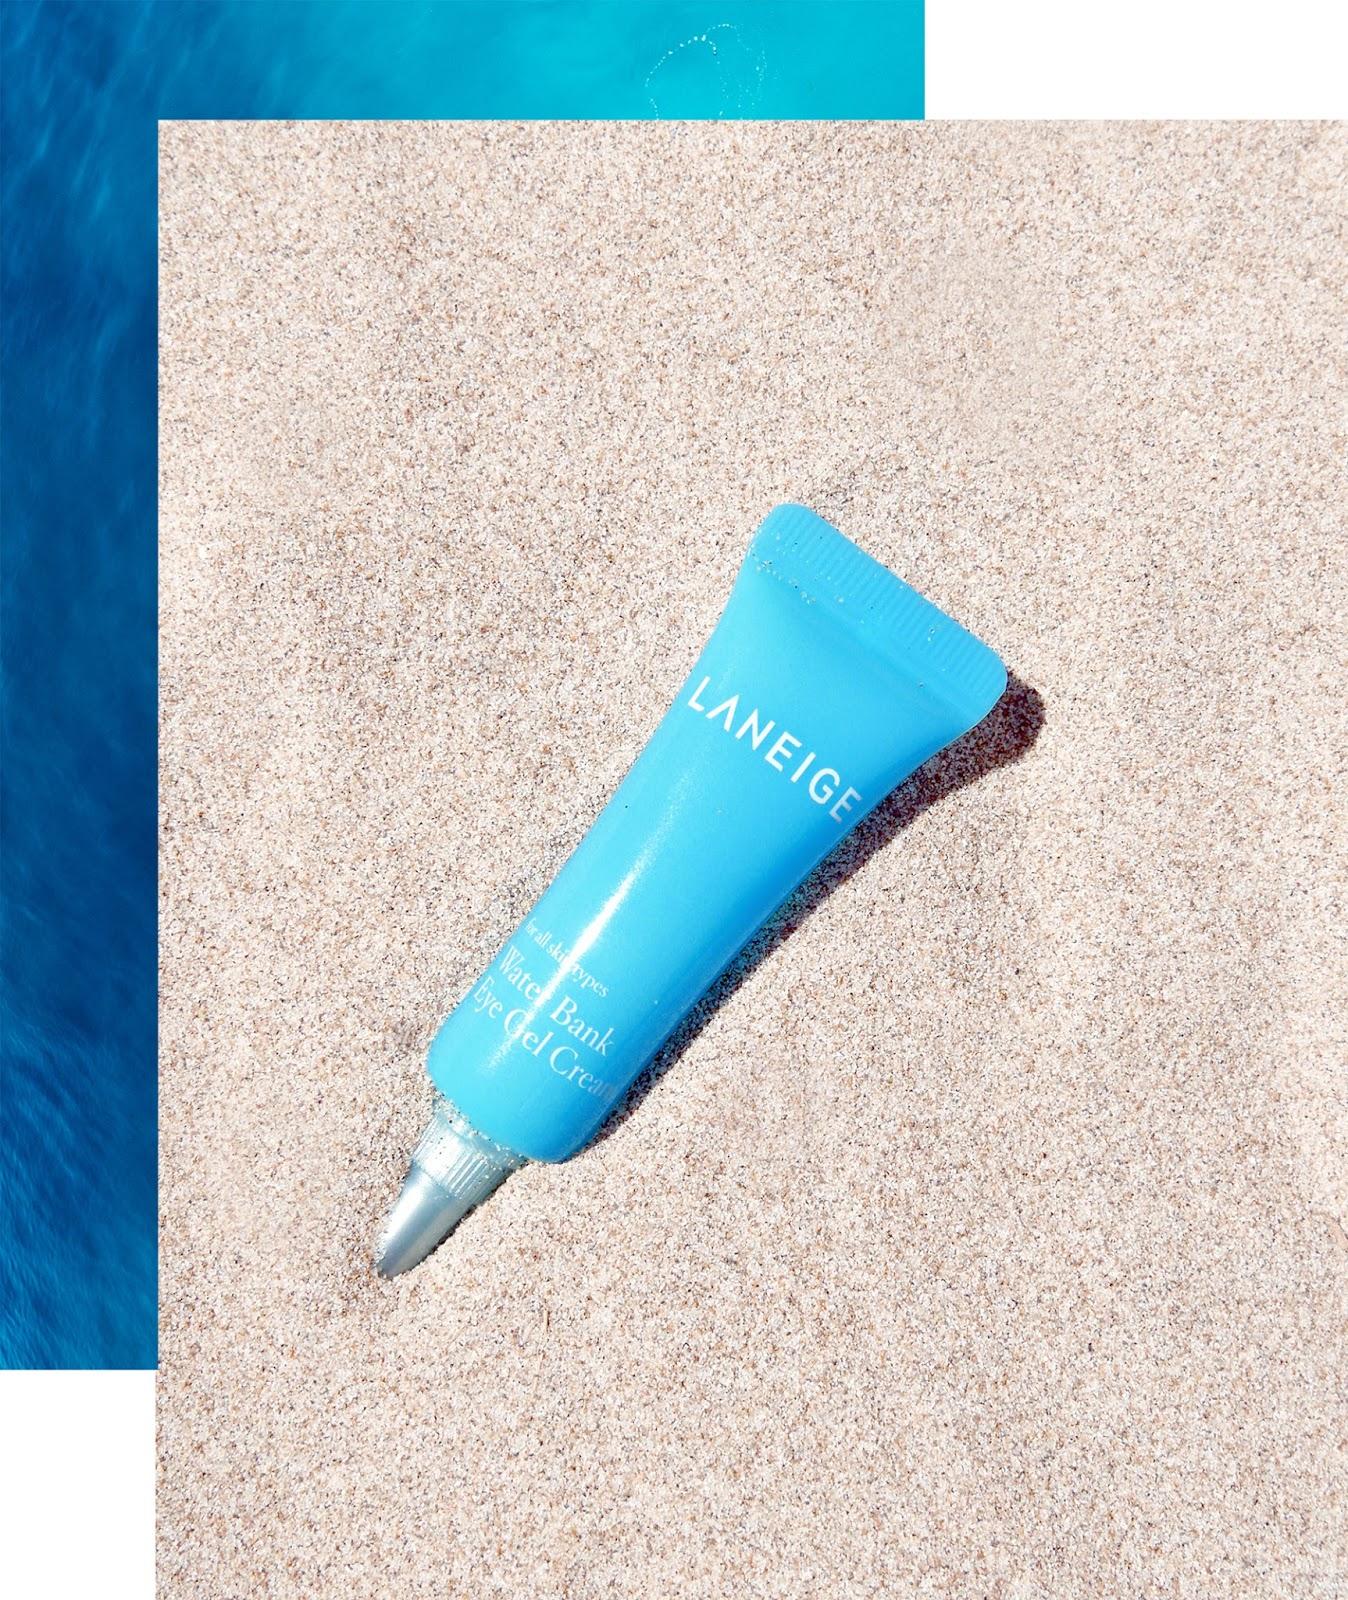 Euriental | luxury travel & style | travel beauty products, Laneige water bank eye gel